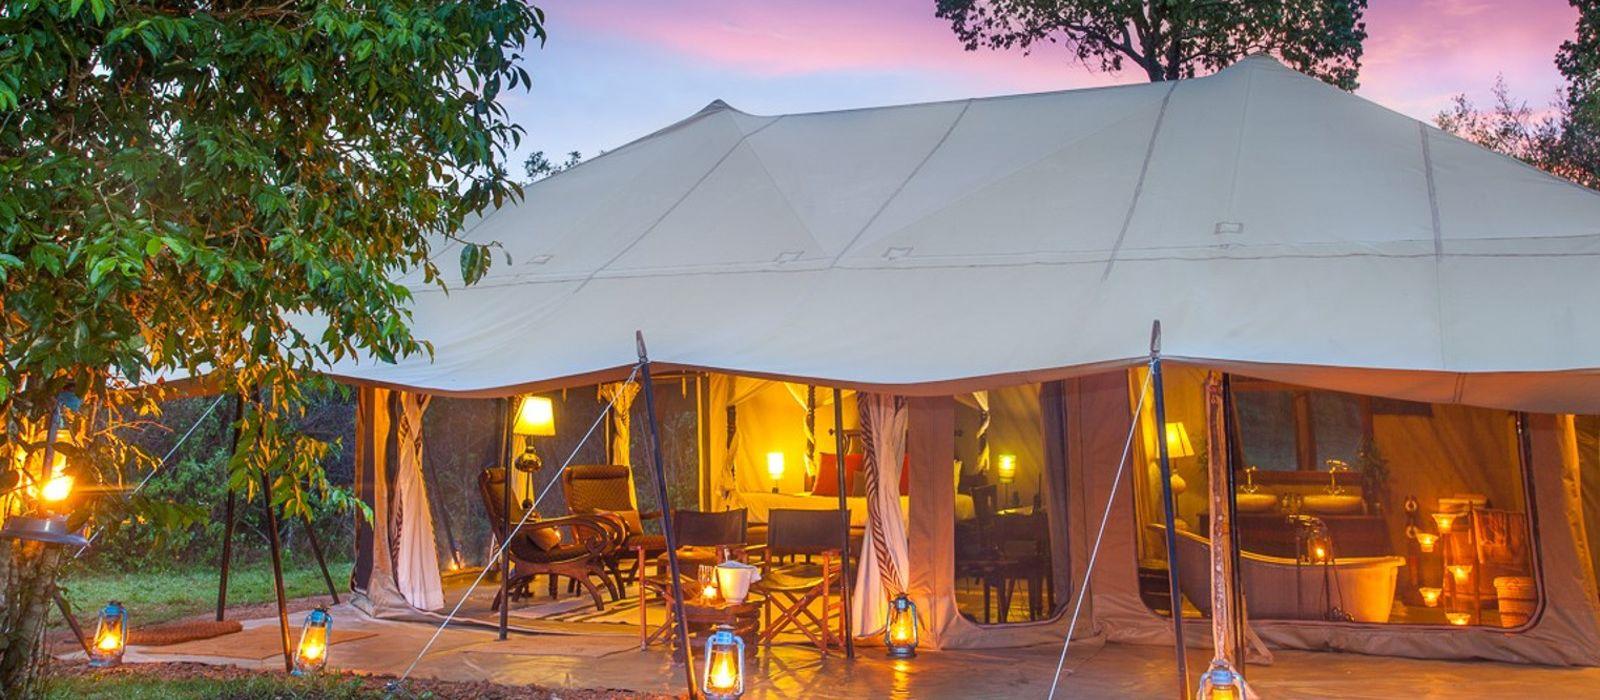 Hotel Mara Ngenche Safari Camp Kenya